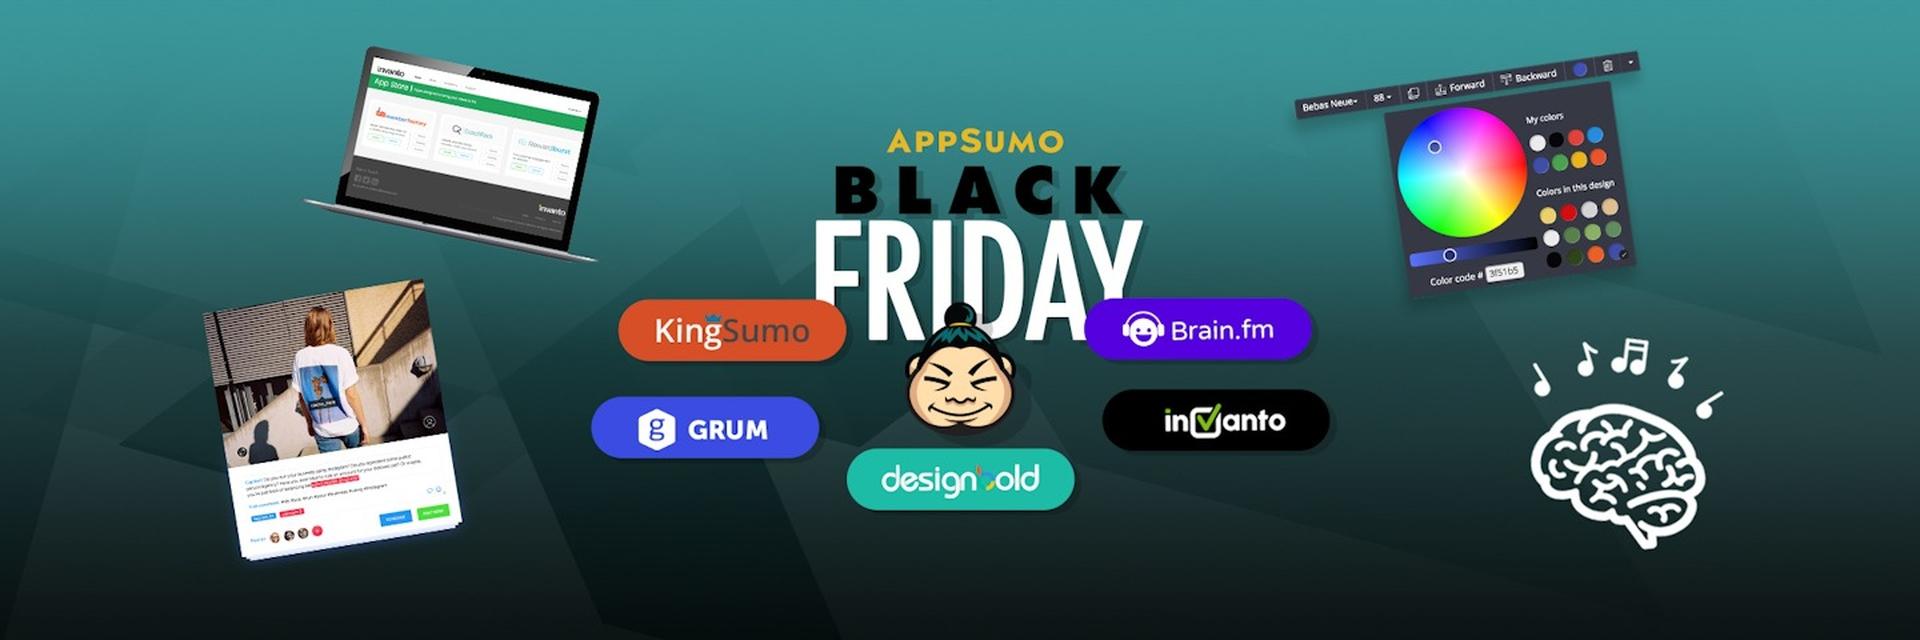 AppSumo Black Friday $37